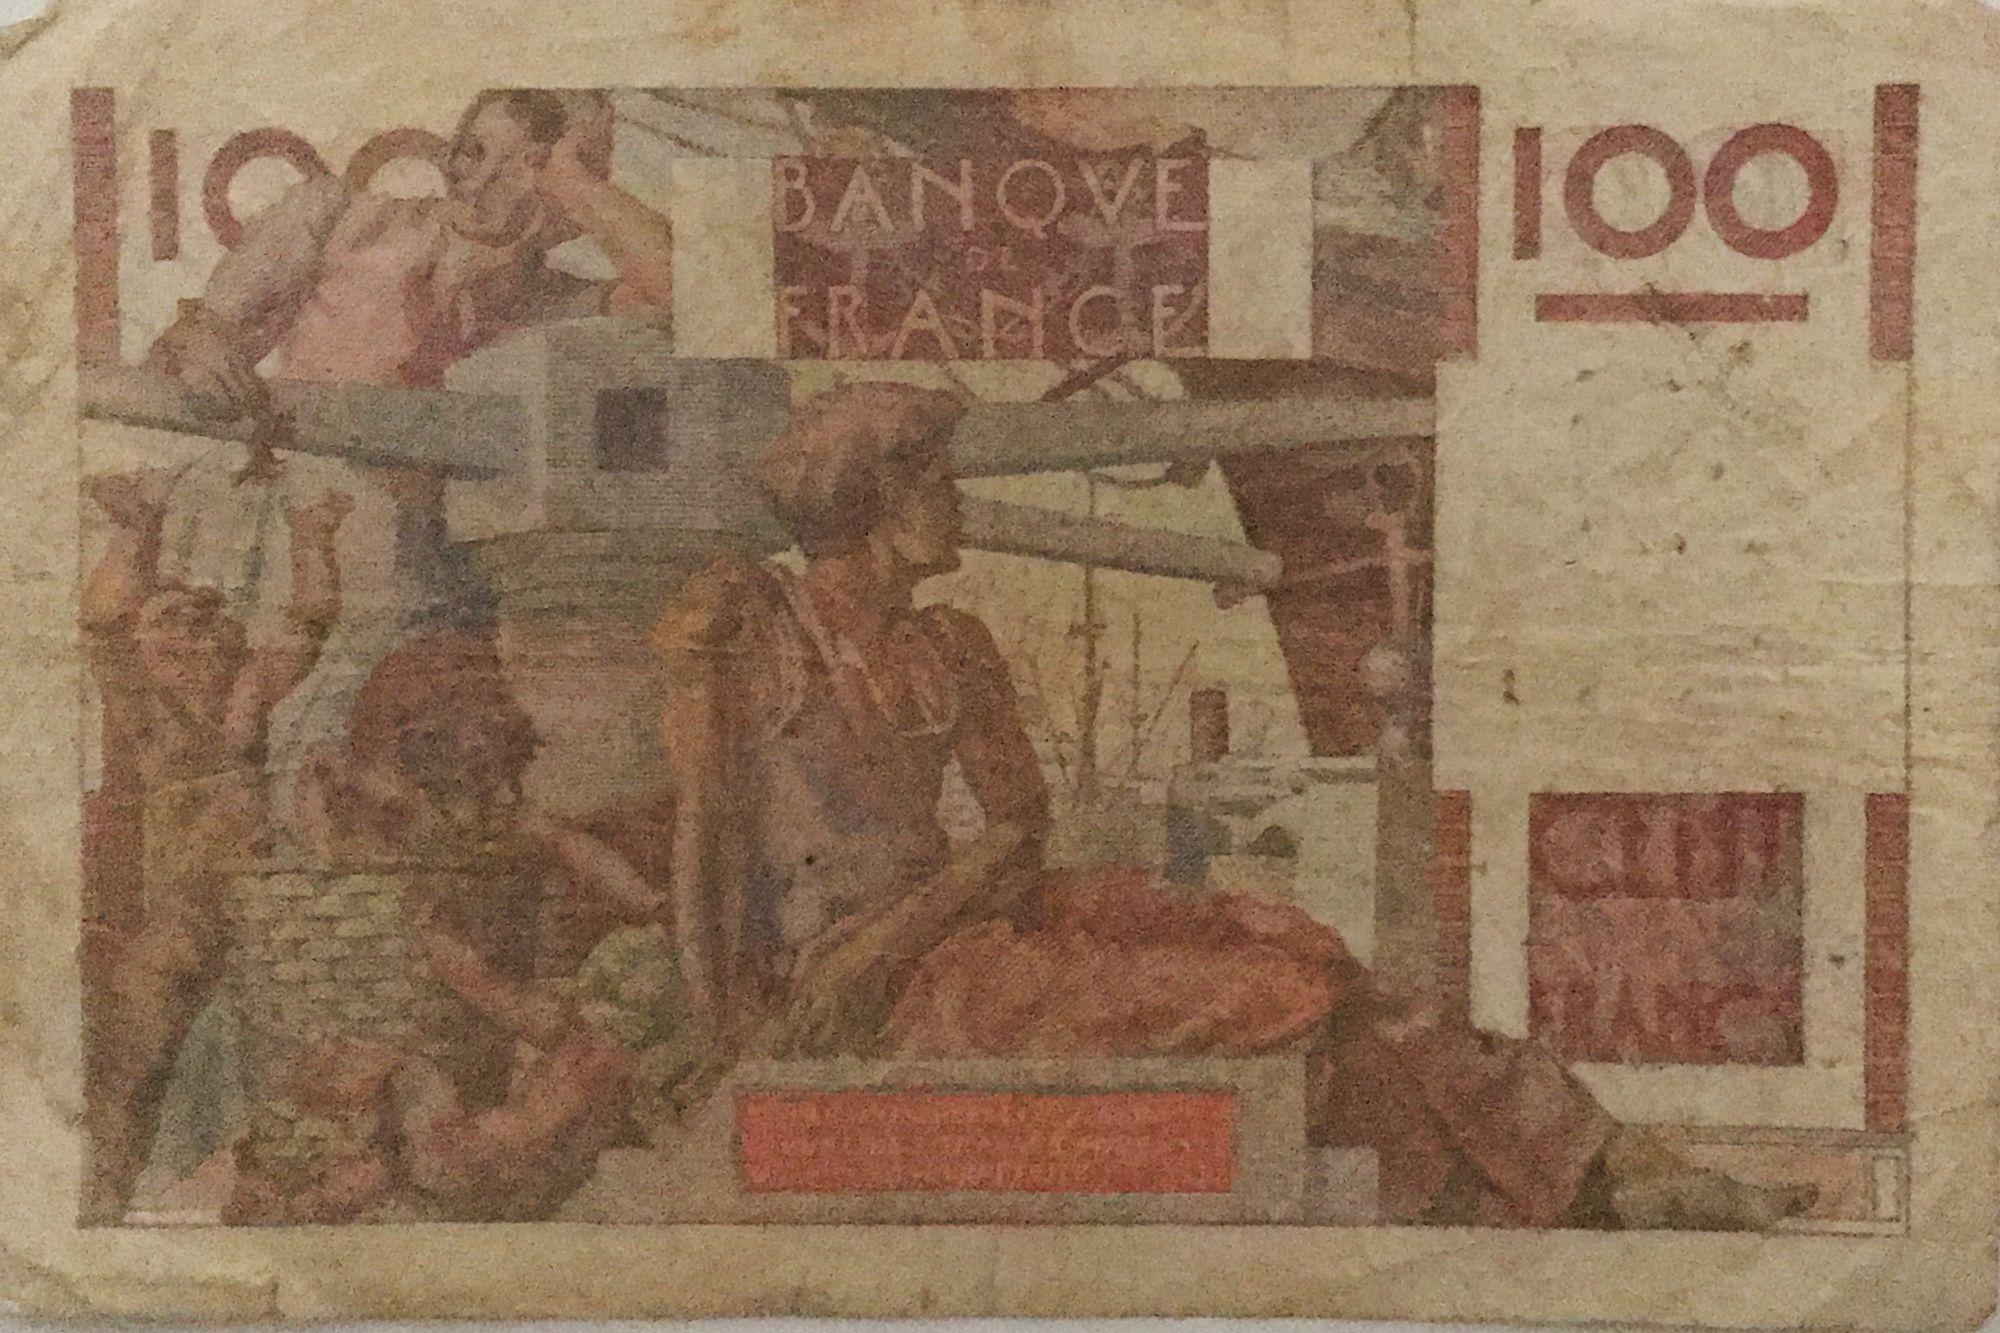 France 100 Francs Young Farmer - 16-11-1950 - Serial V.379 - F